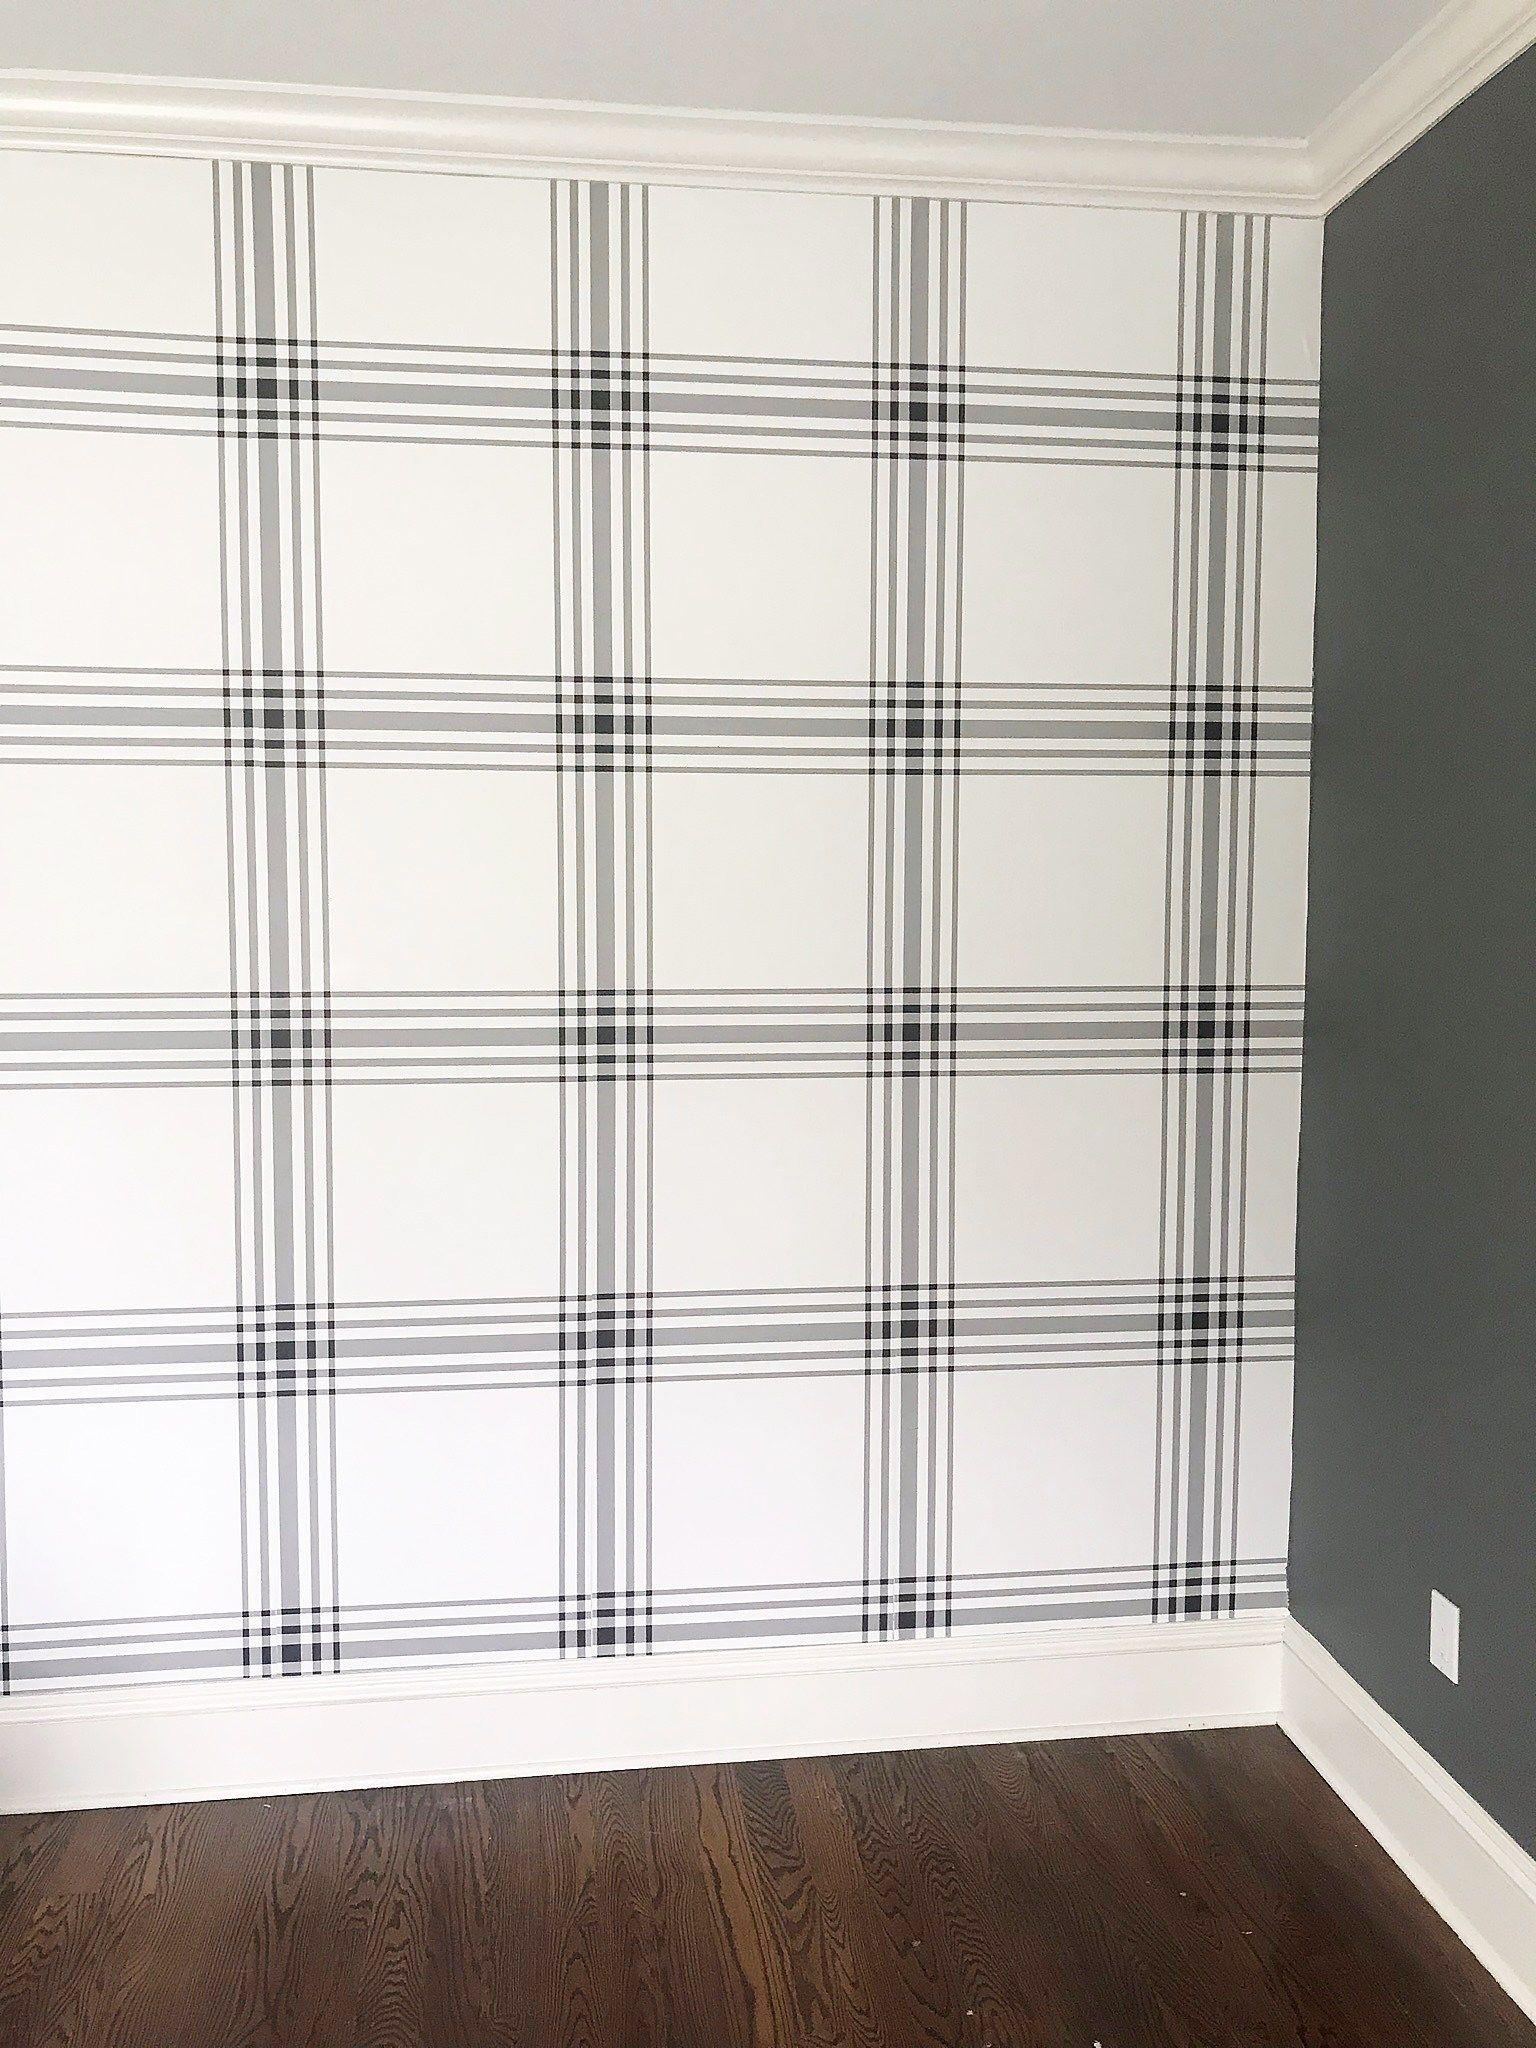 Beginner Guide How to Hang Wallpaper How to hang